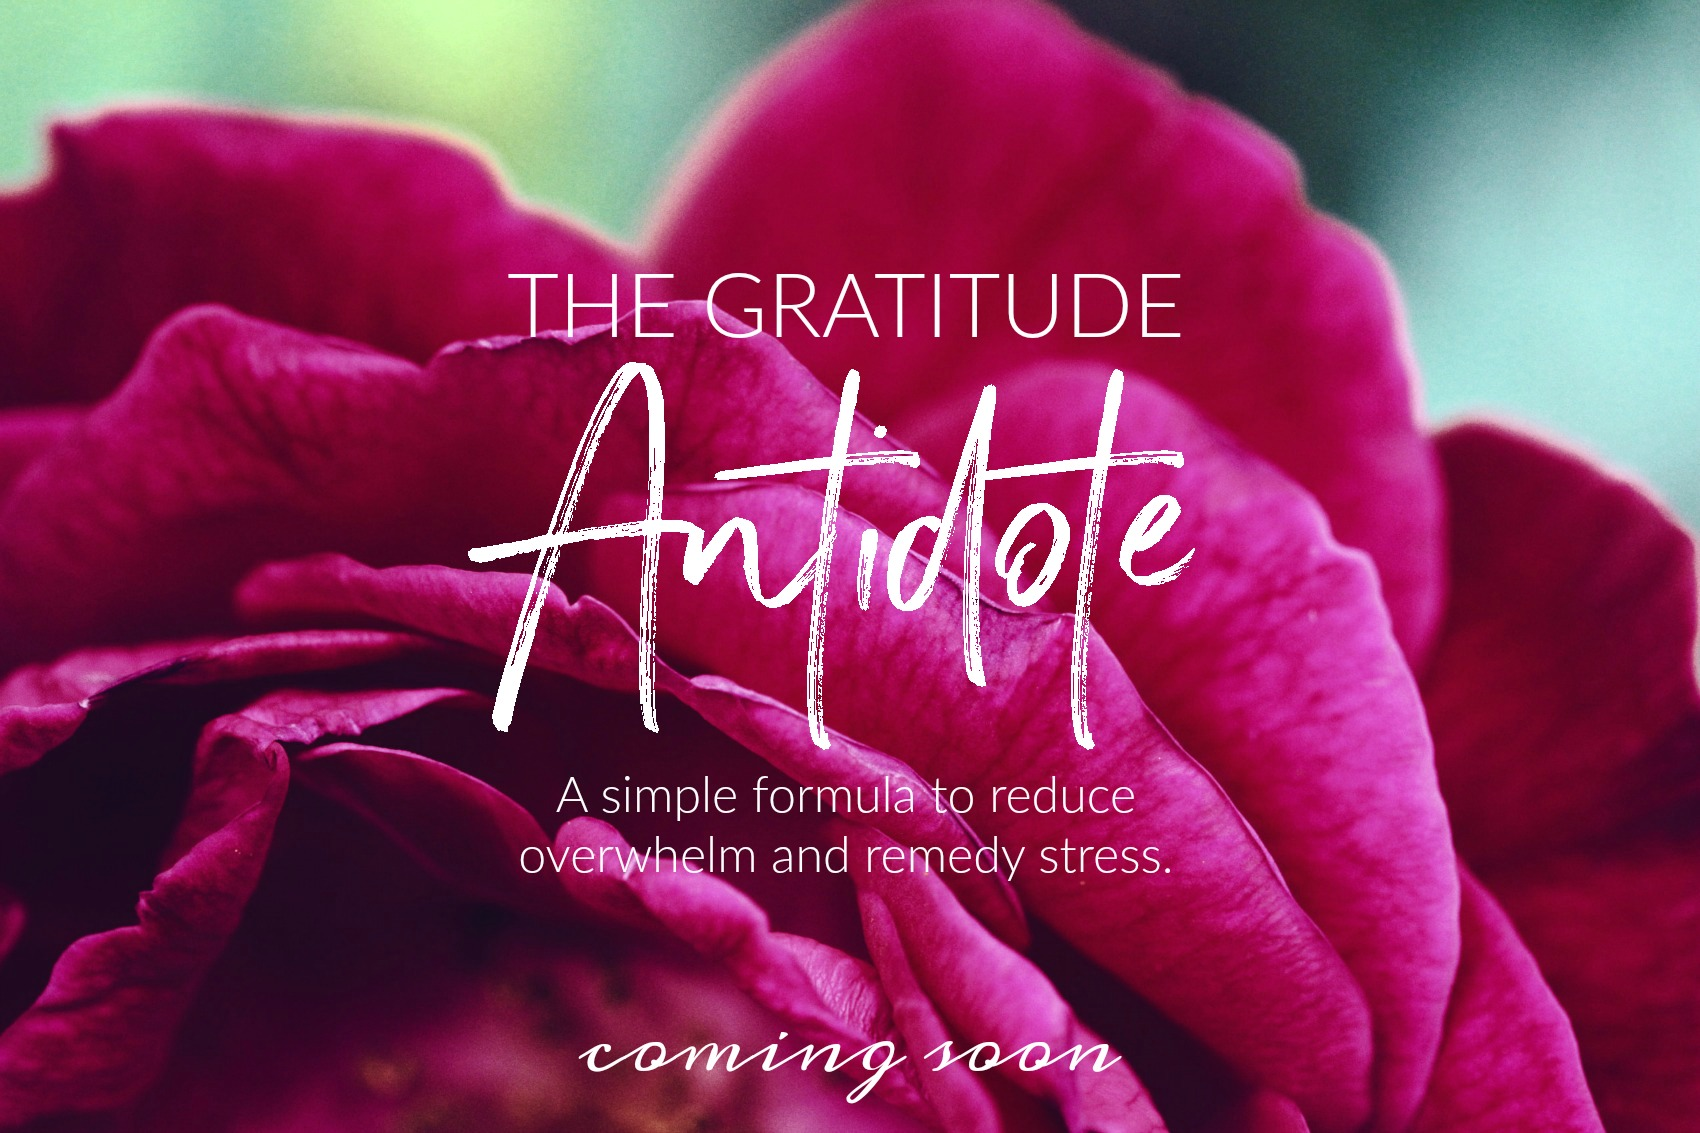 The Gratitude Antidote. Circle of Daydreams. www.circleofdaydreams.com